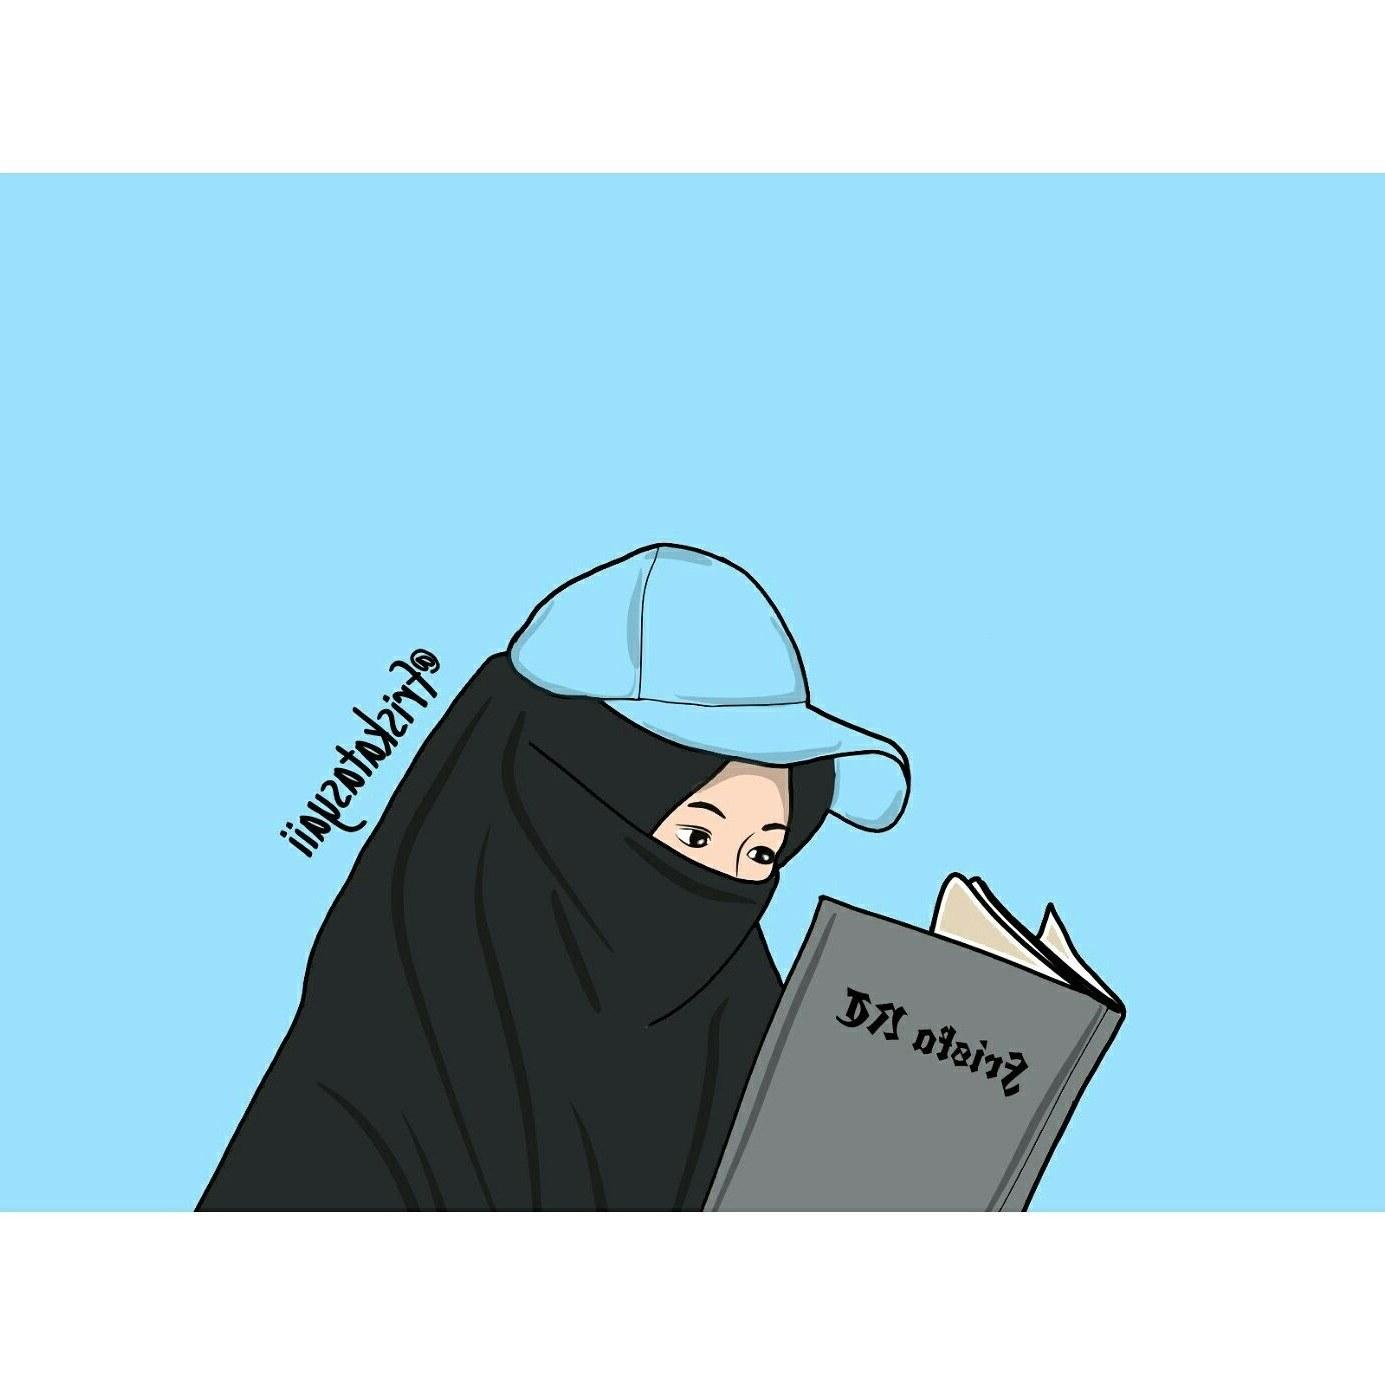 Inspirasi Muslimah Kartun Bercadar Qwdq Gambar Kartun Muslimah Modern Cari Gambar Keren Hd